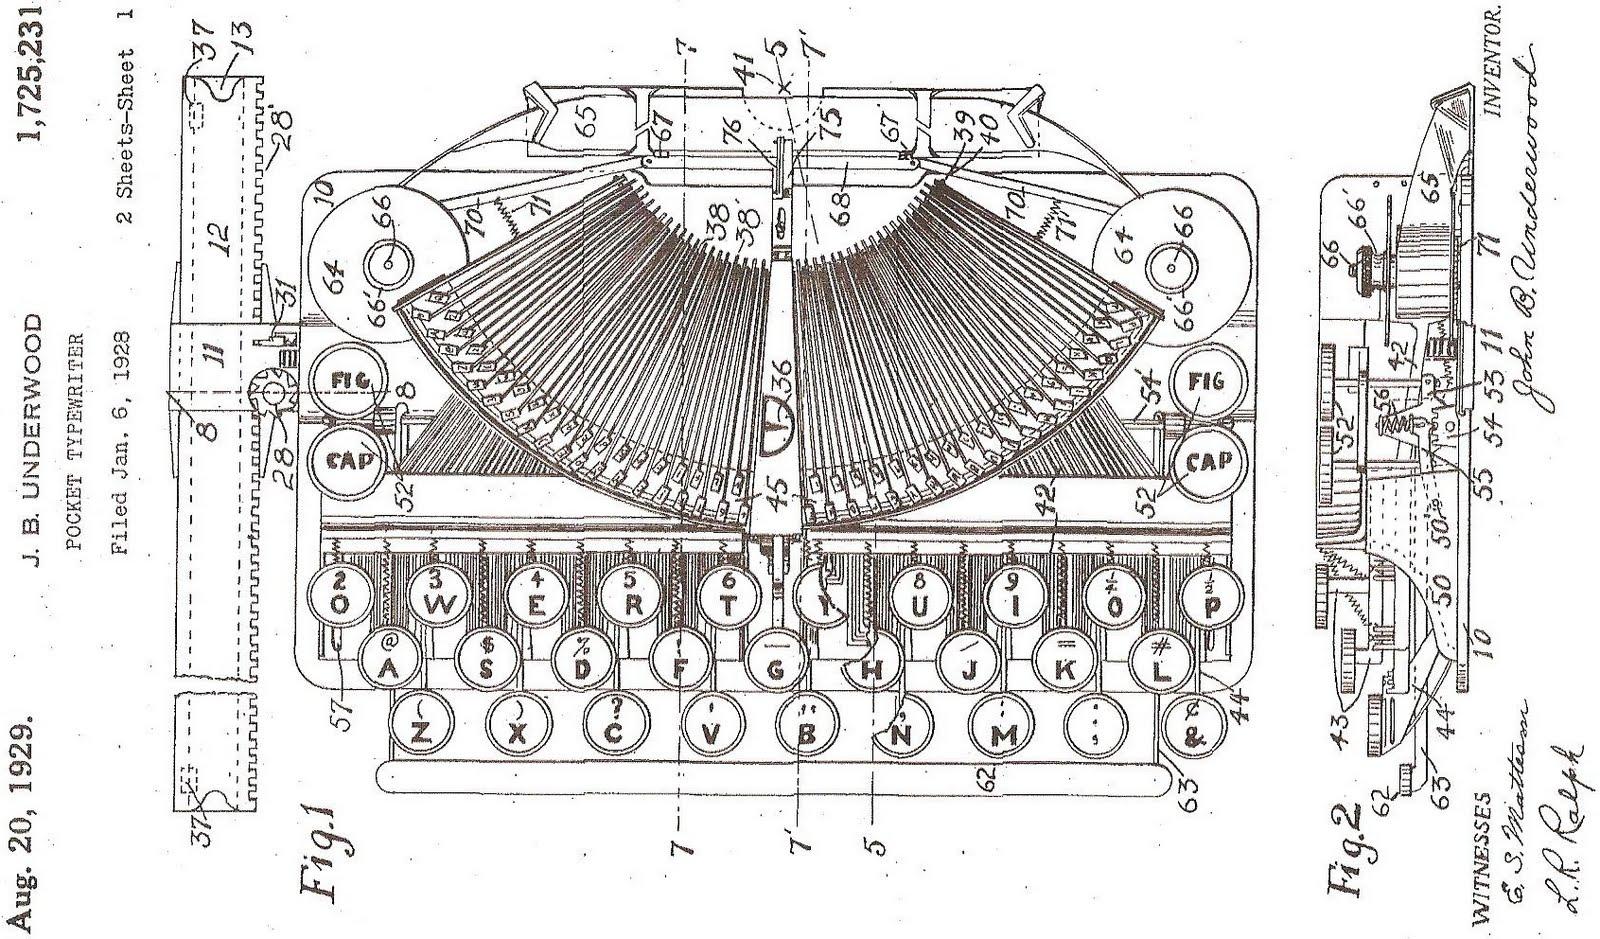 oz.Typewriter: On This Day in Typewriter History (XCII)